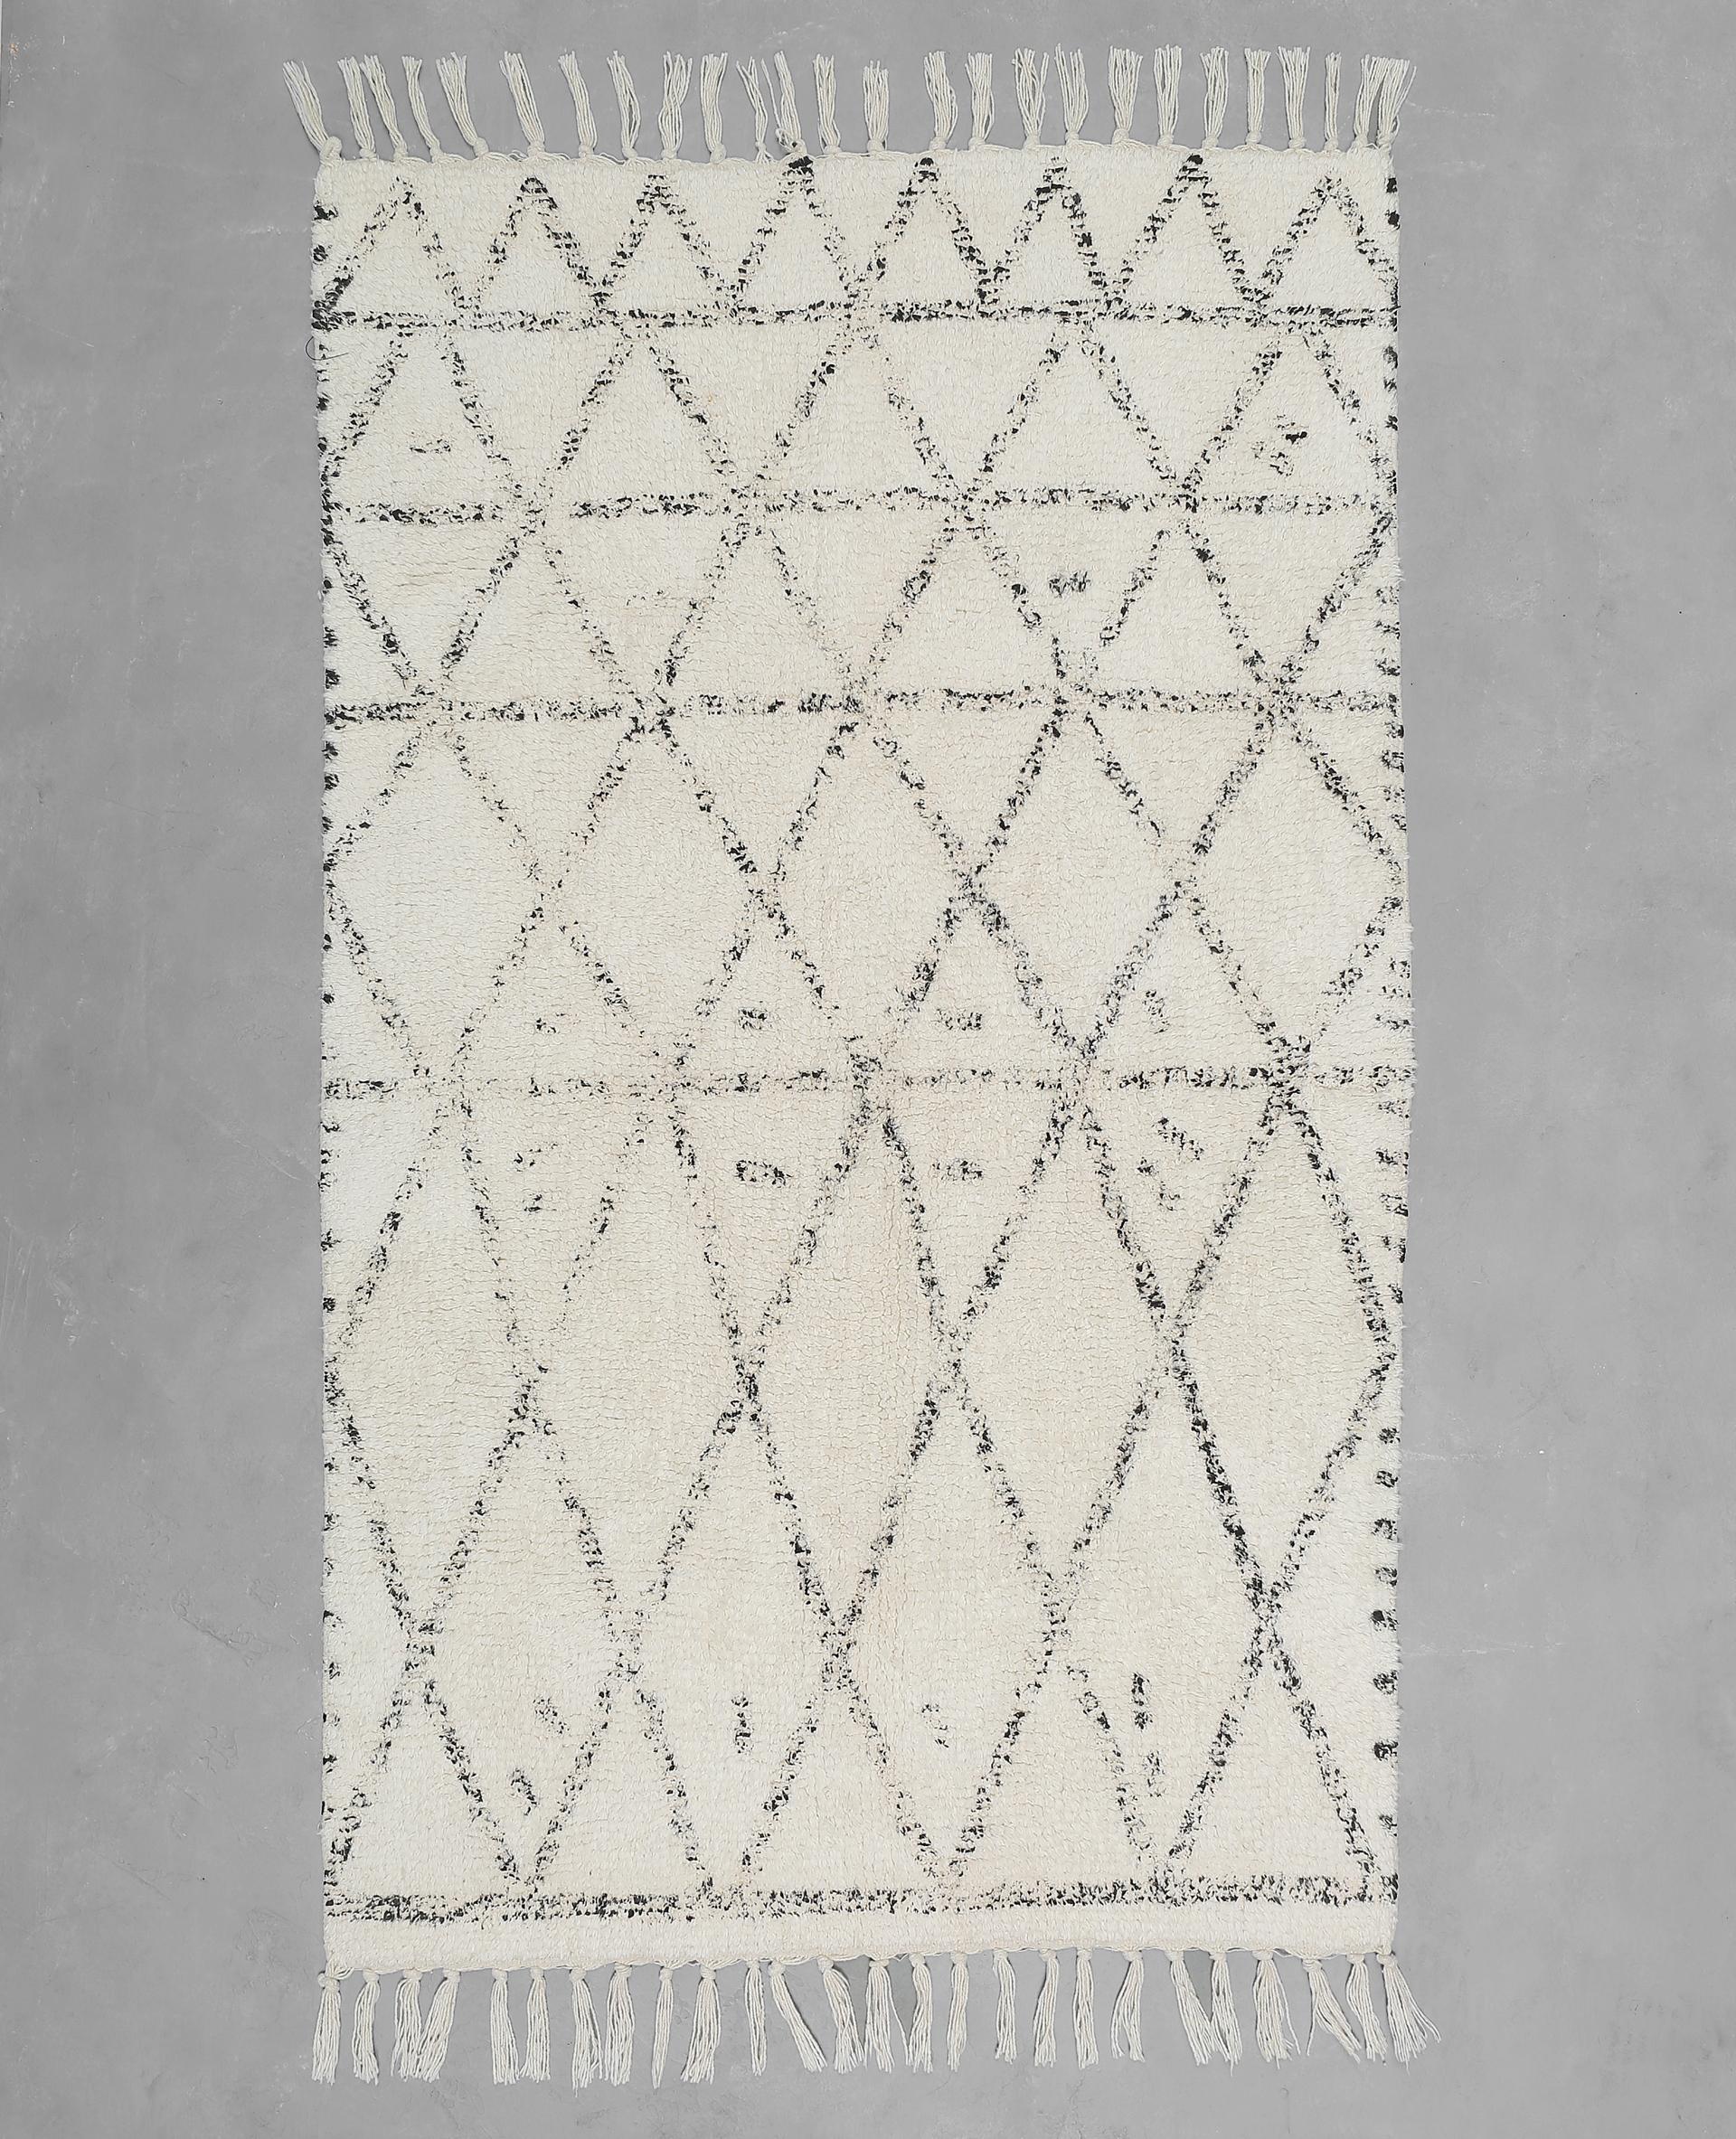 tapis doux berb re cru 955083765i08 pimkie. Black Bedroom Furniture Sets. Home Design Ideas